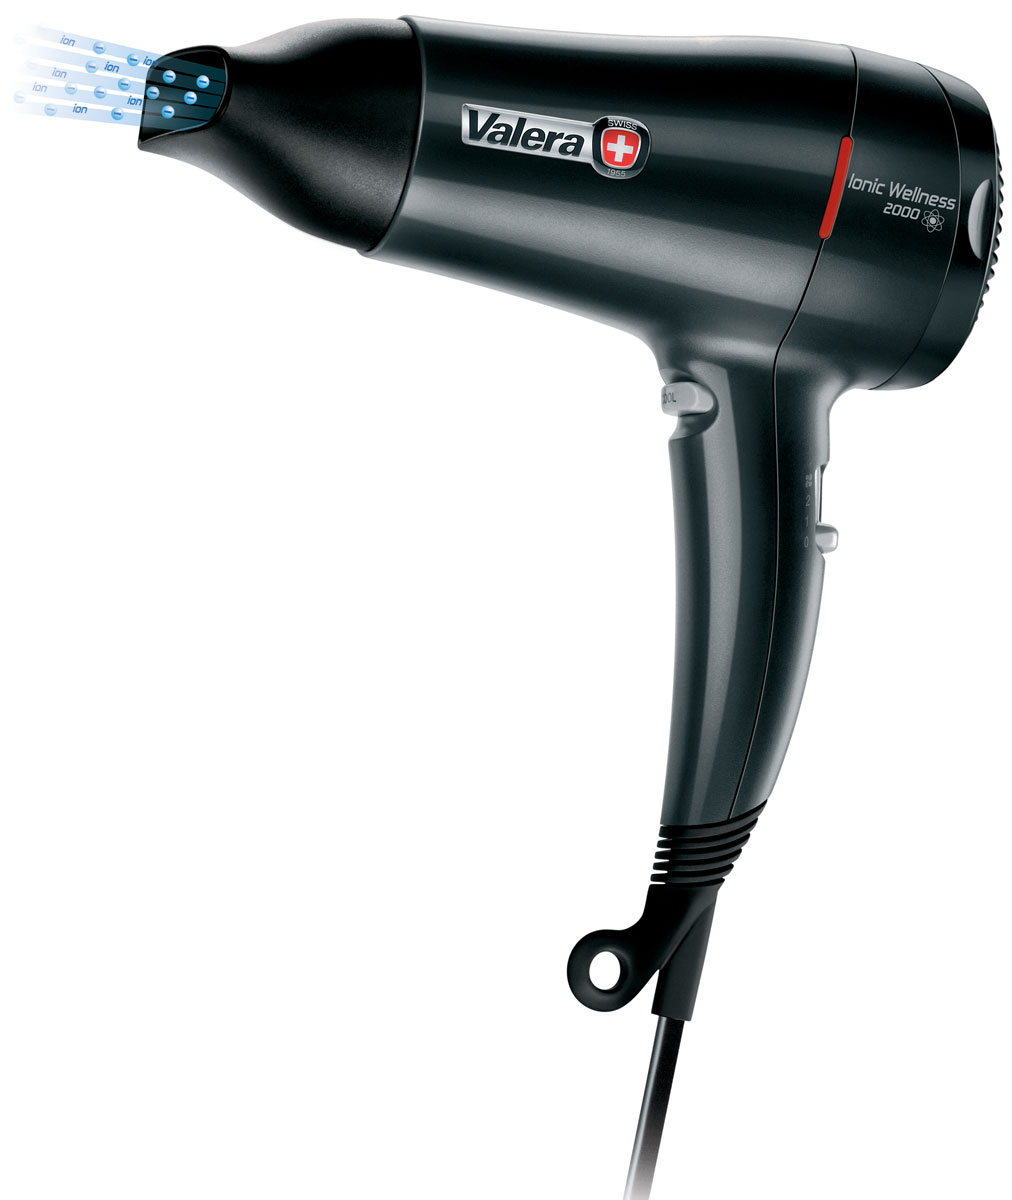 Valera 545.08DV Ionic Wellnes, Black фен со сниженным уровнем шума